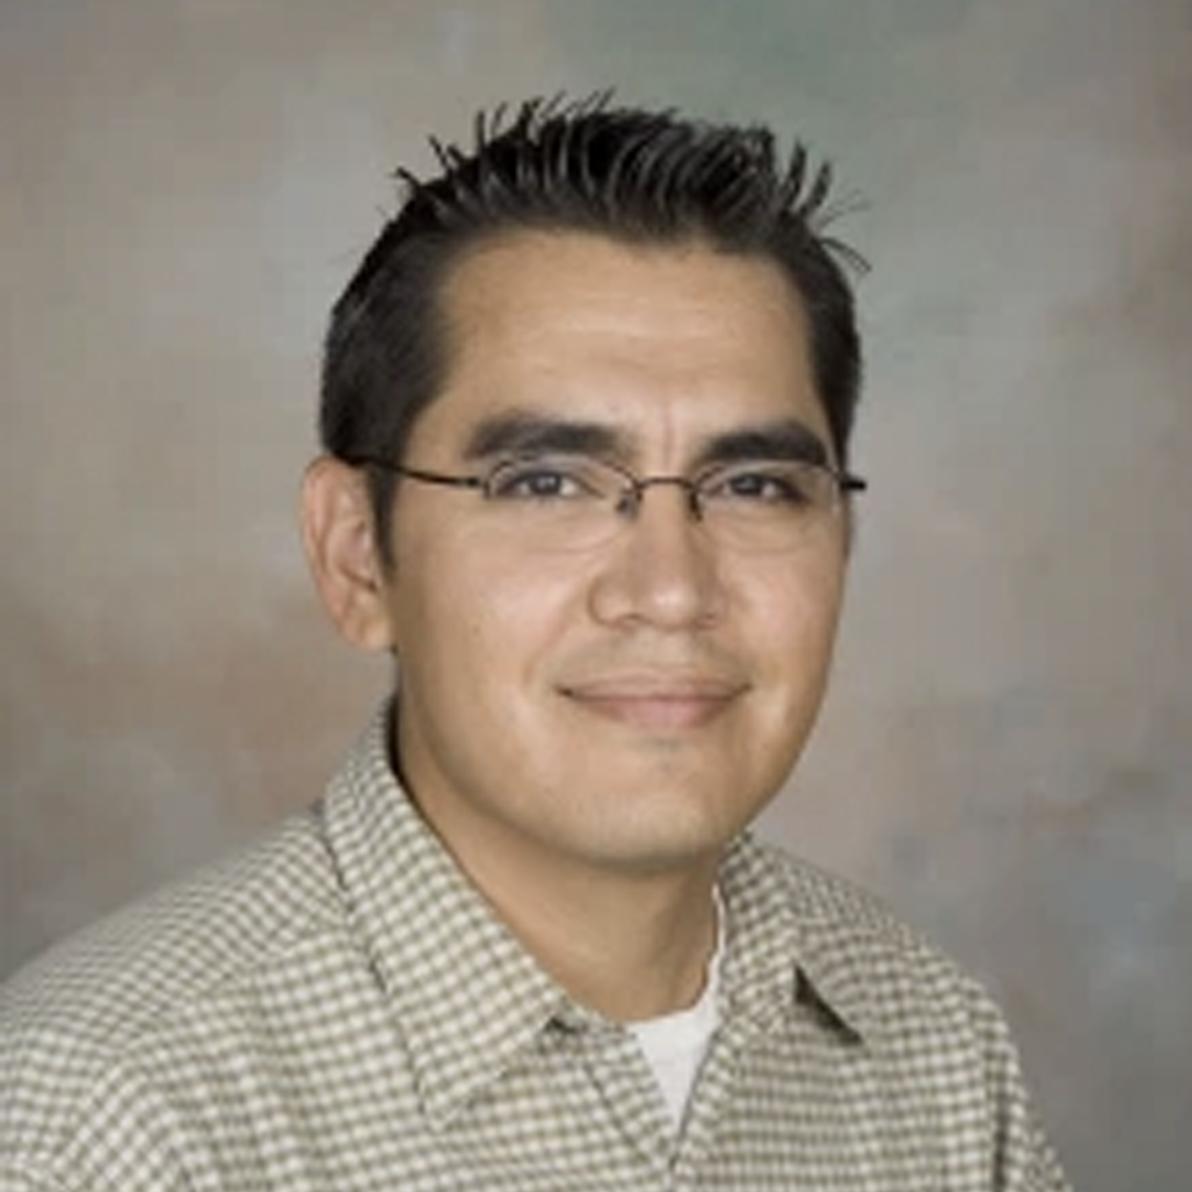 Dr. Oscar J. Murillo, Jr